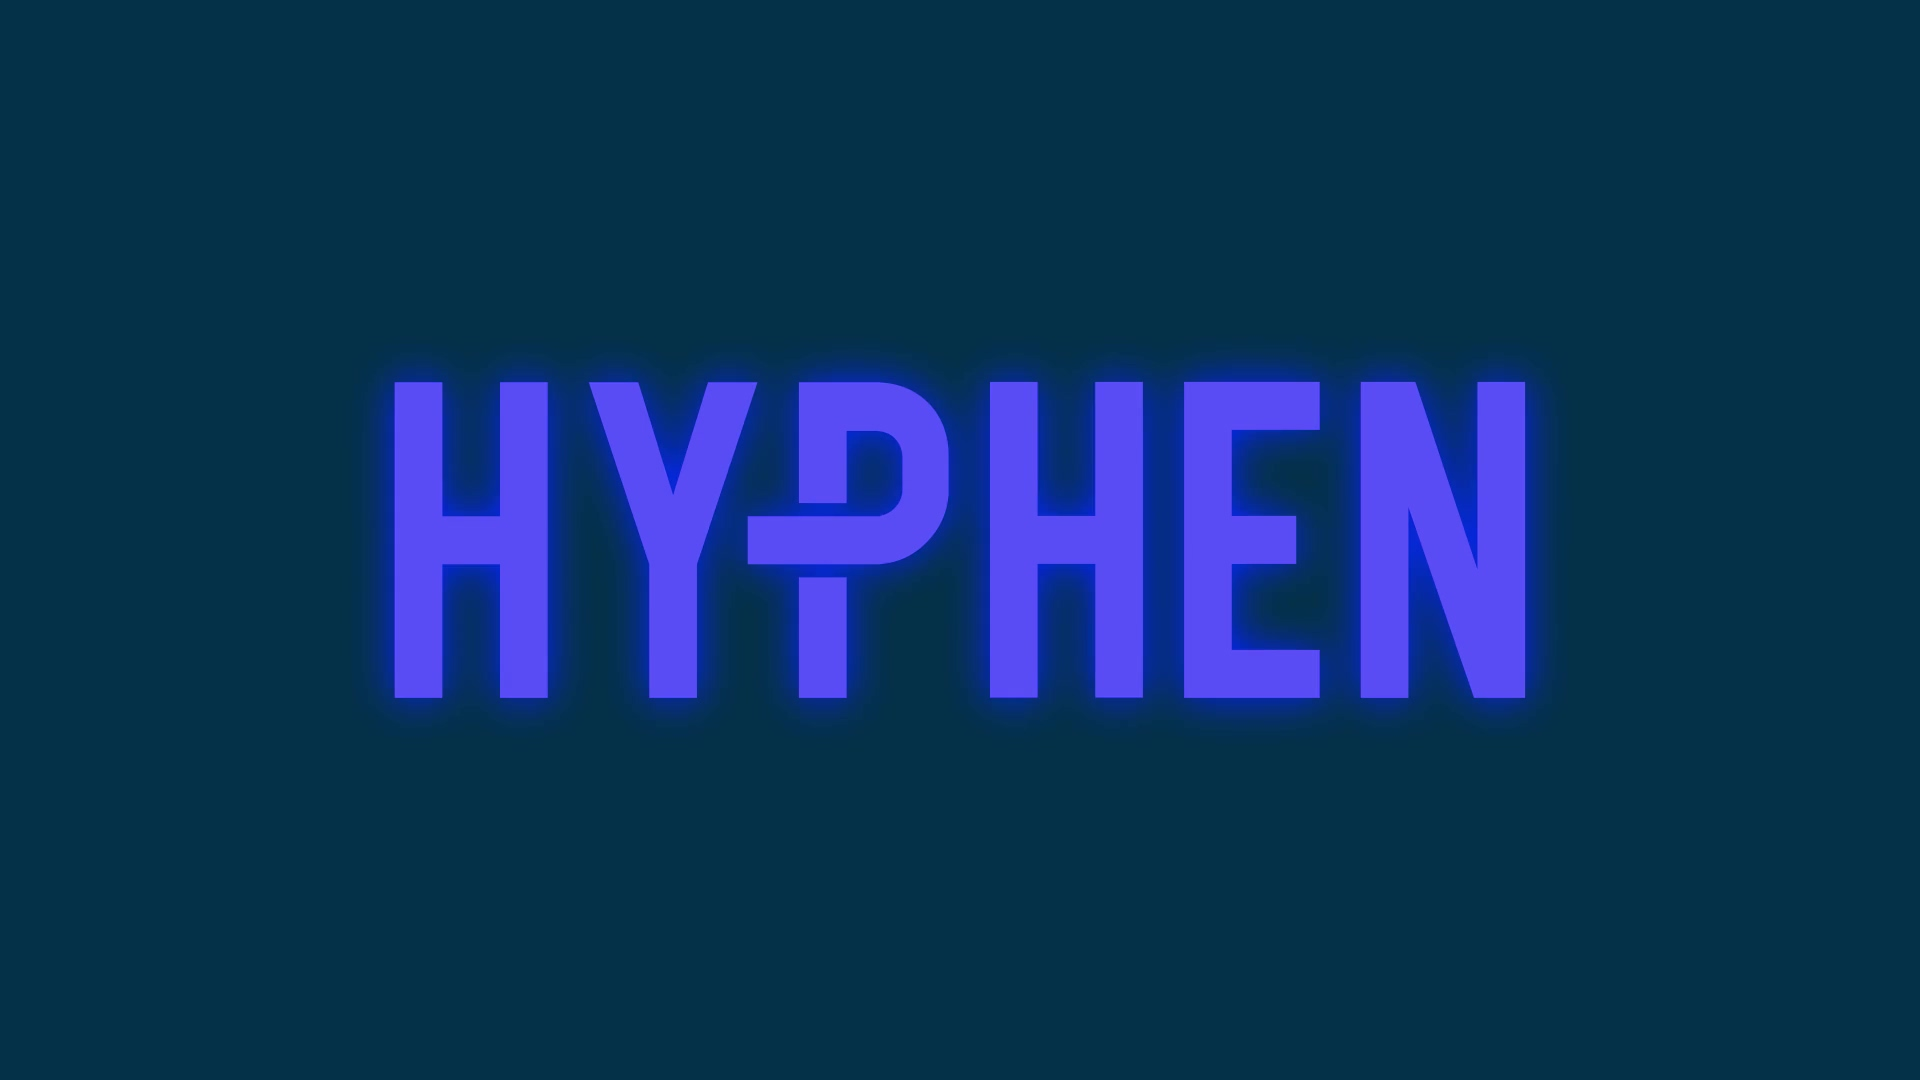 1646 Hyphen Showreel - Royalty Free Track Edit 1